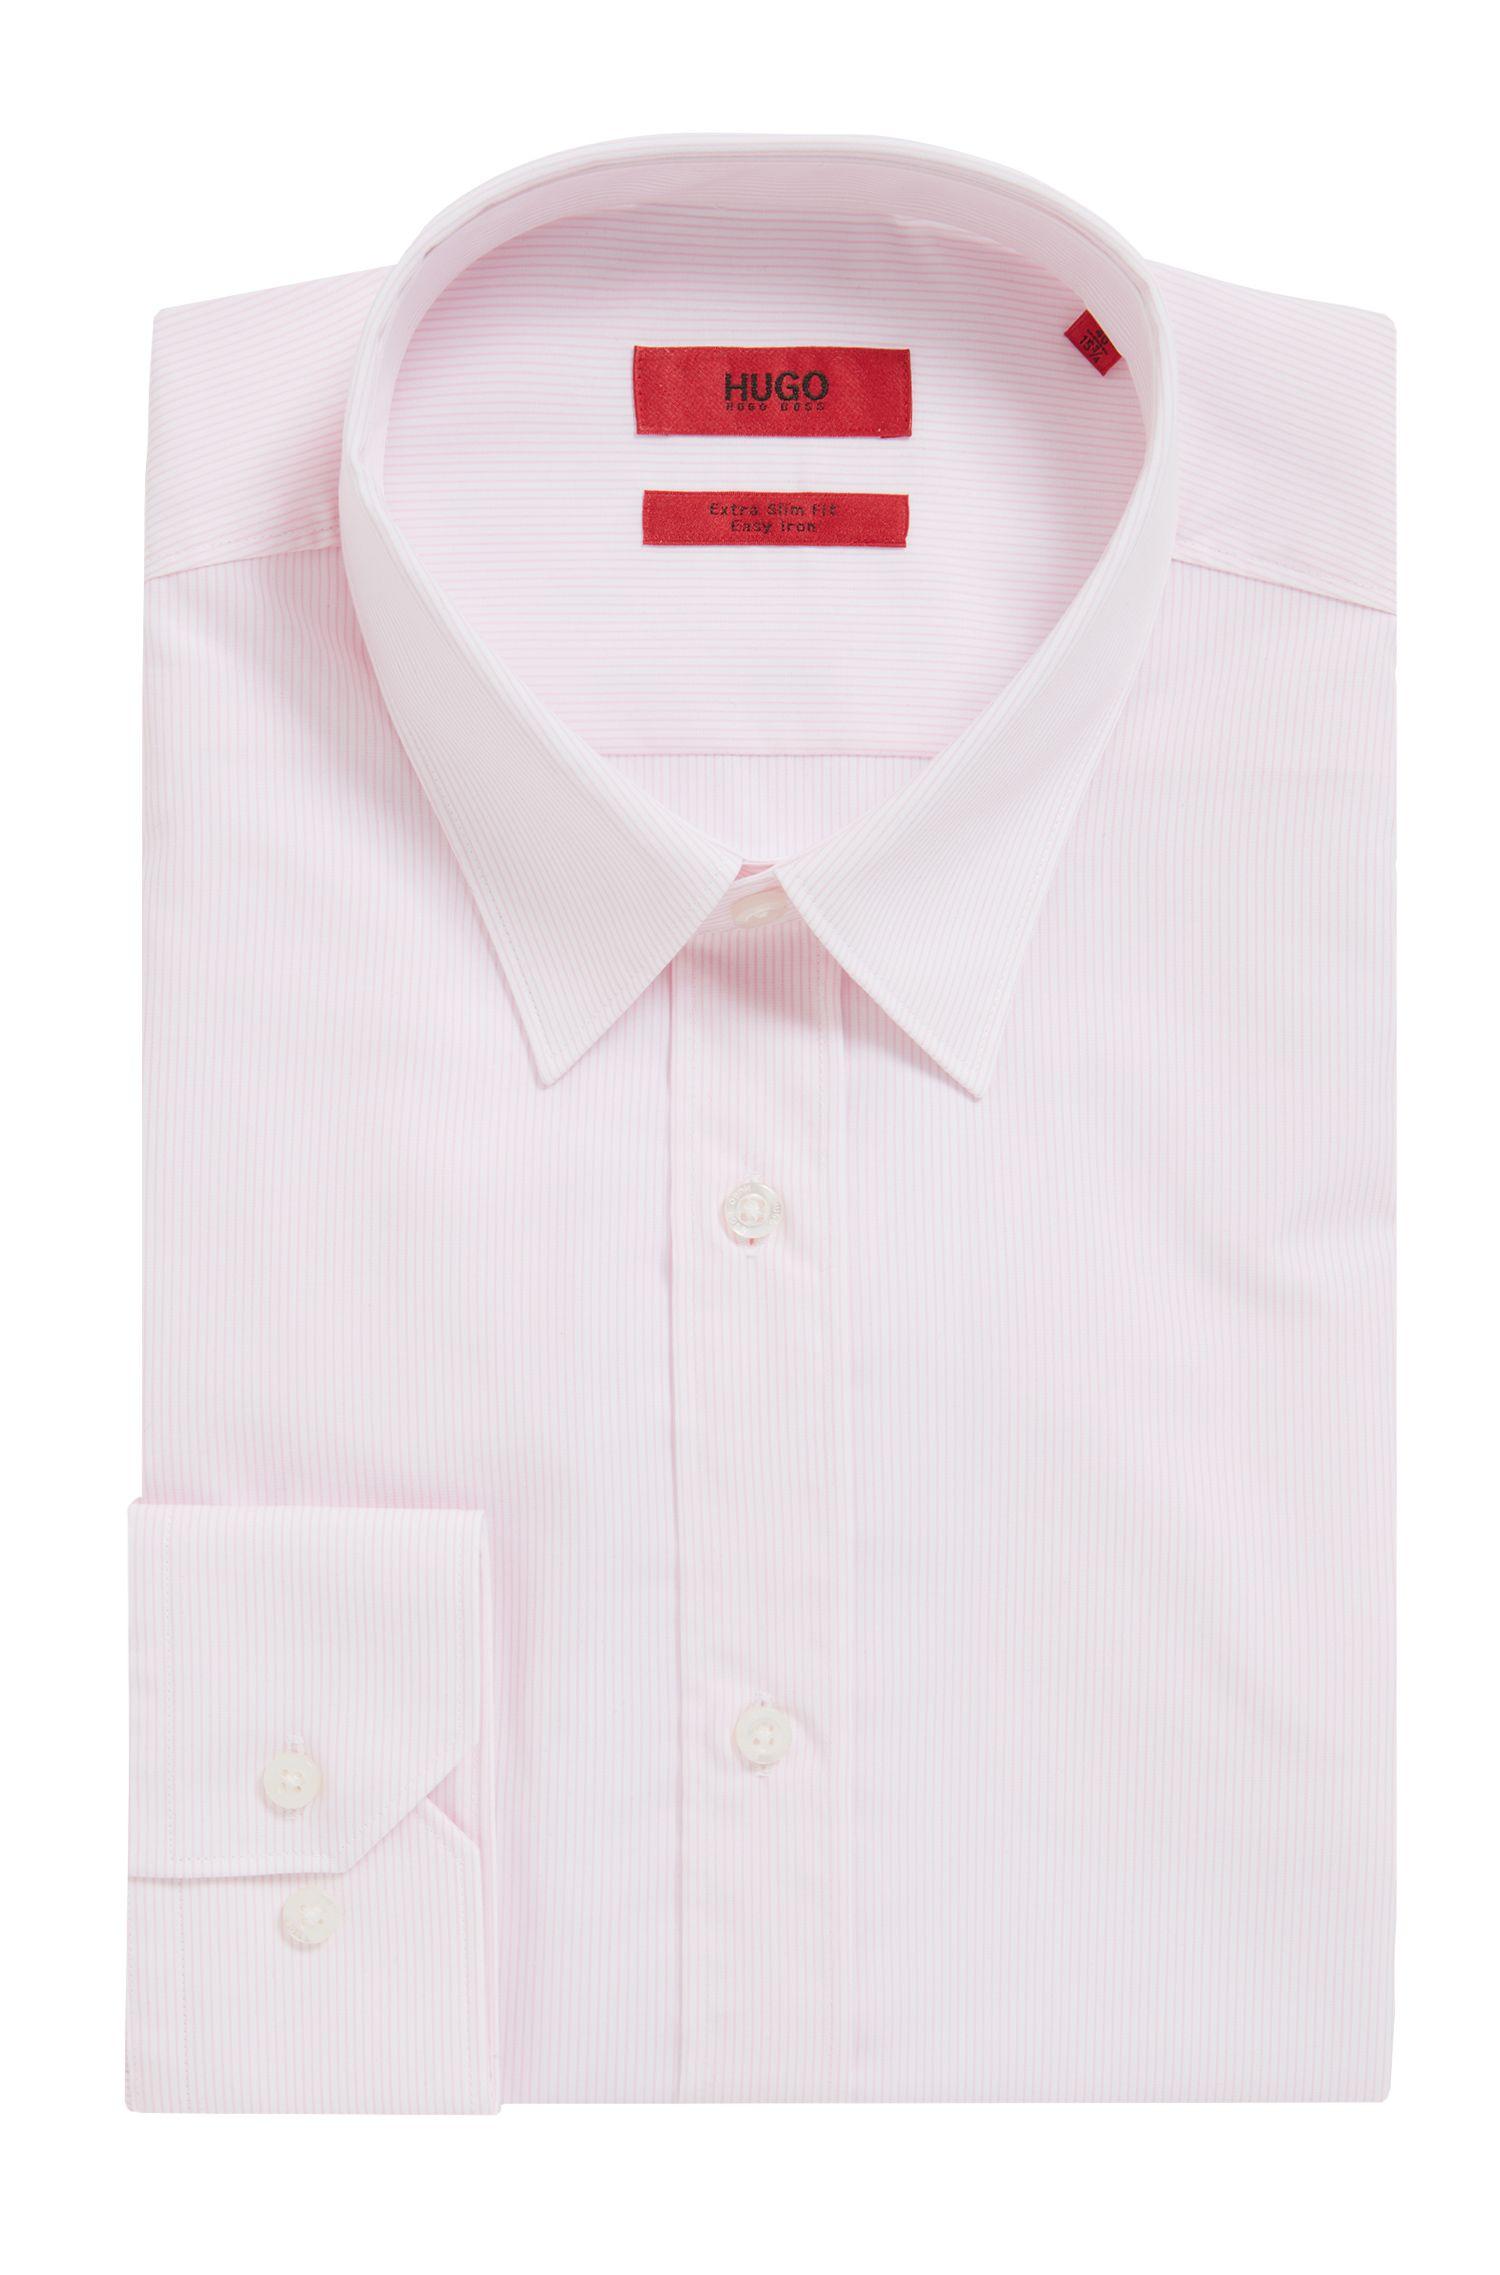 'Elisha' | Slim Fit, Striped Easy Iron Cotton Dress Shirt